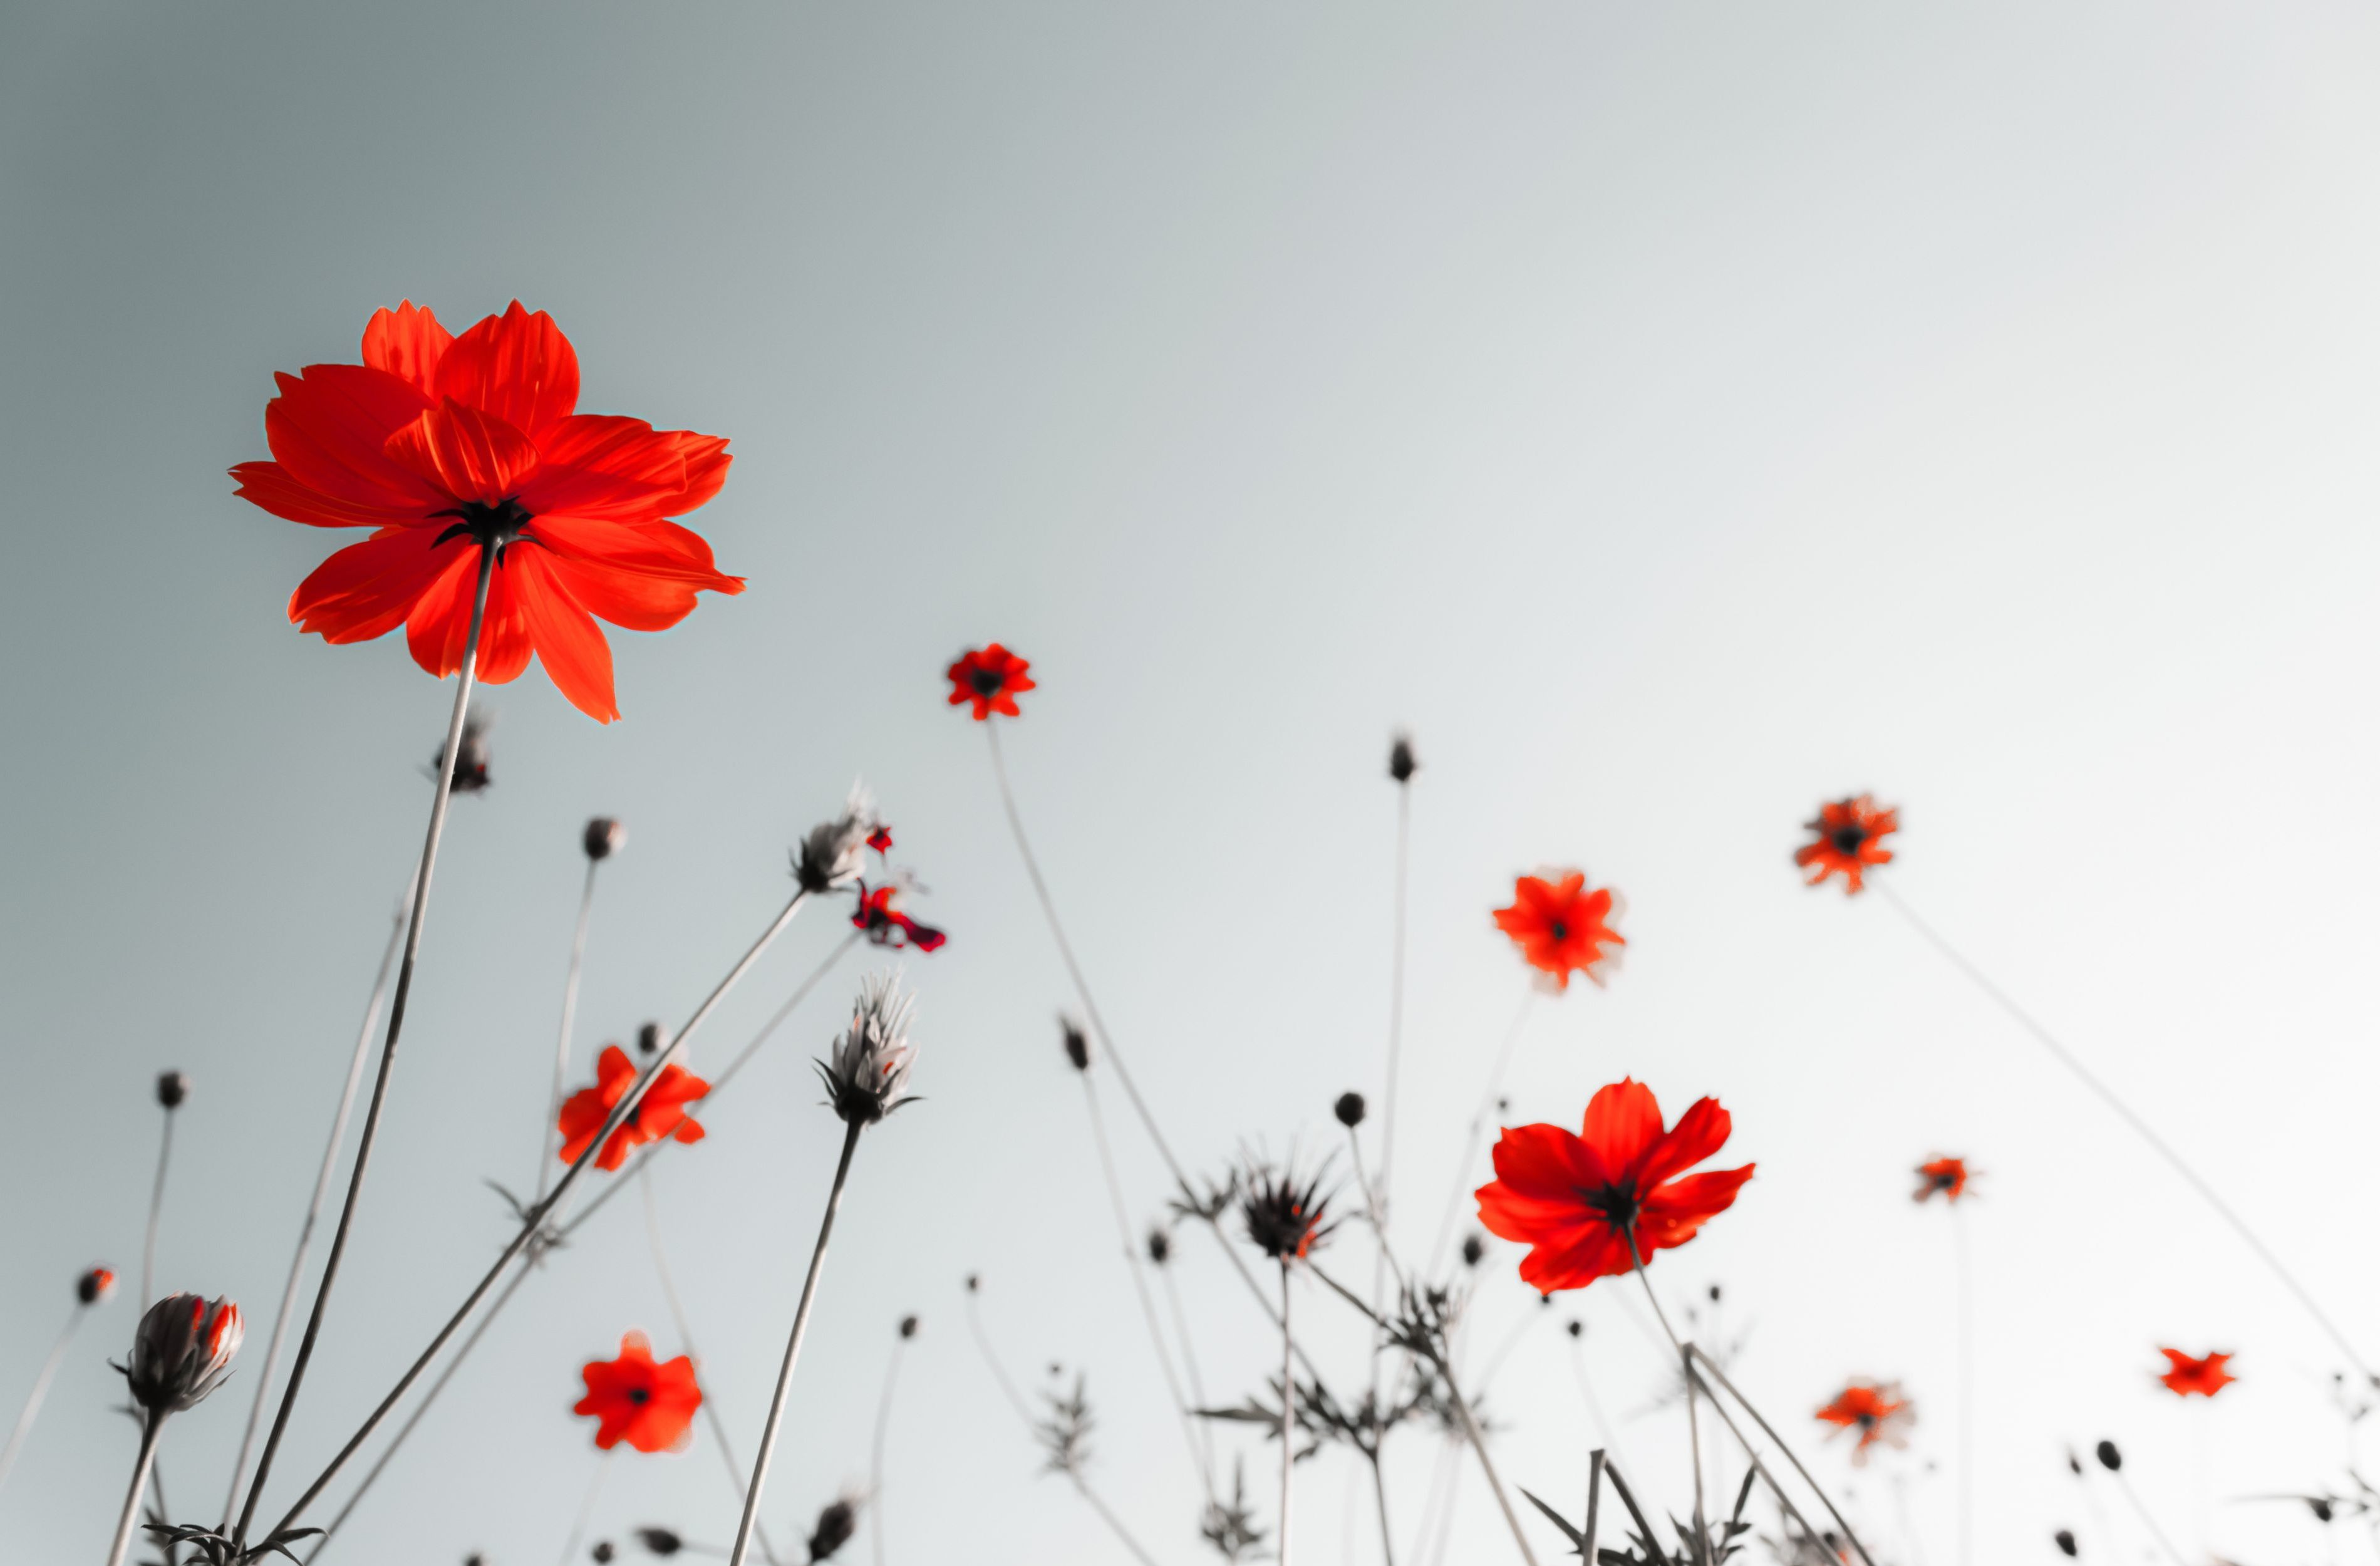 Flower poppy poppies wallpaper 3800x2500 228555 wallpaperup mightylinksfo